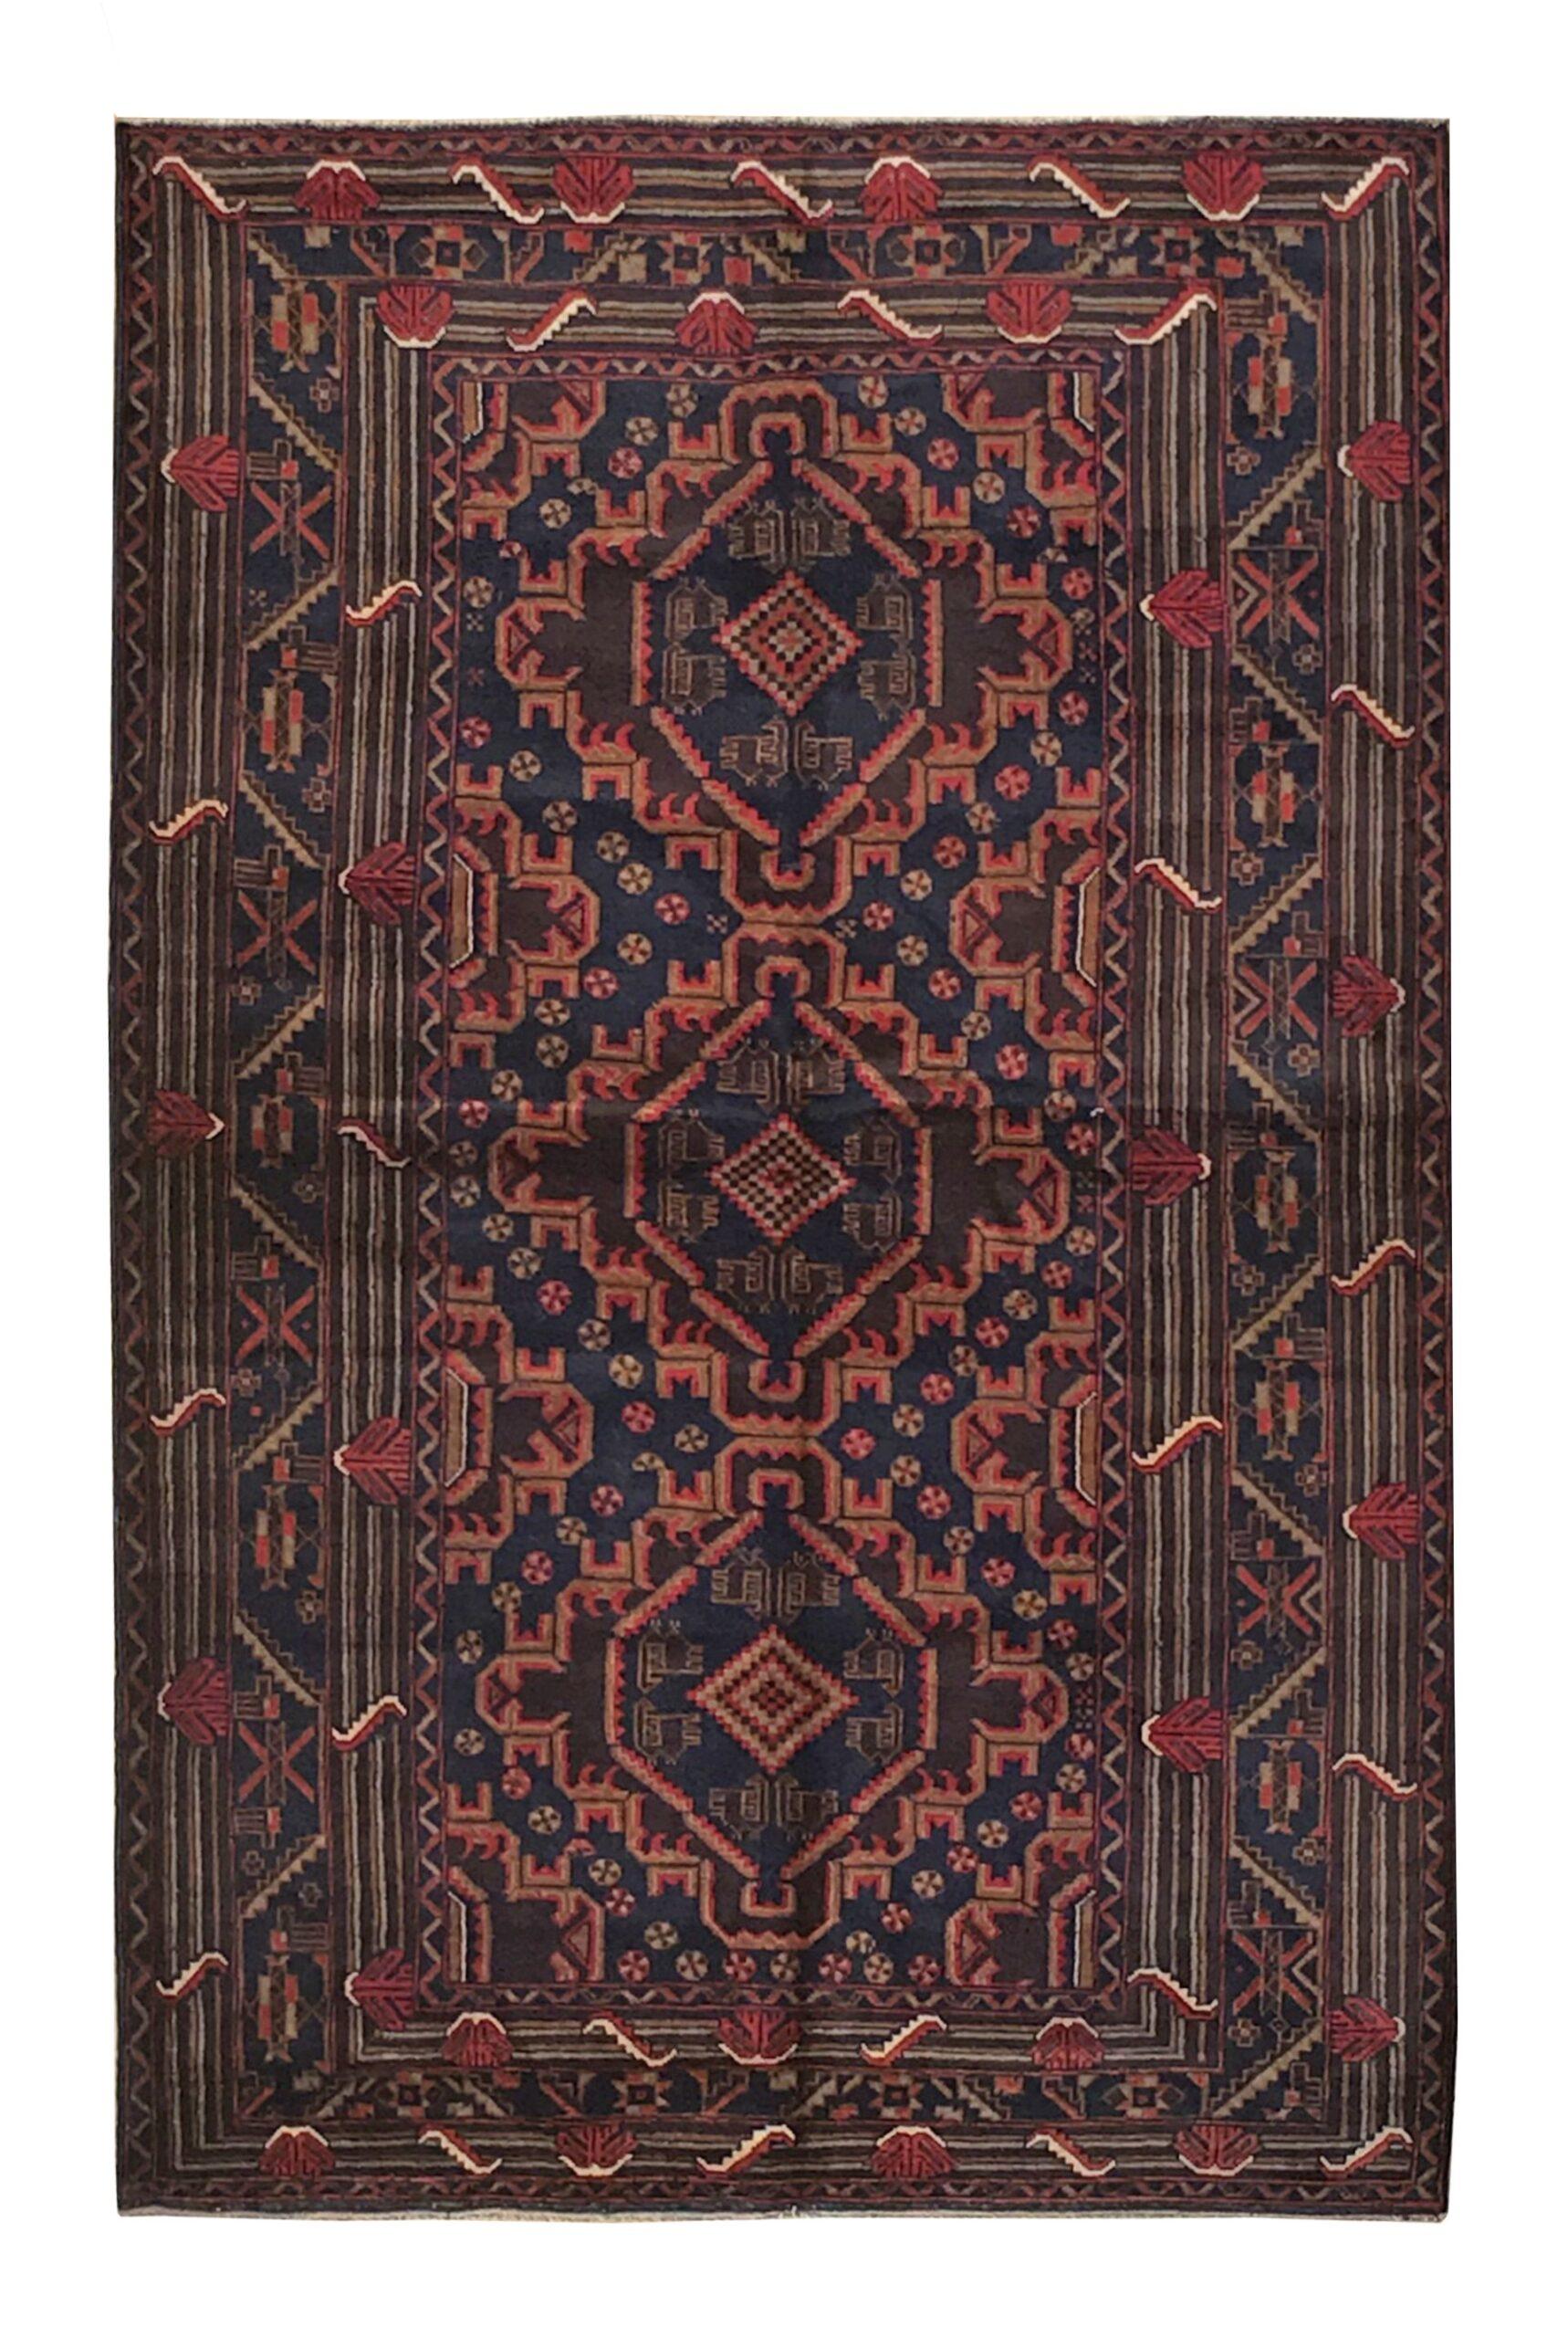 "Balouchi Tribal 3' 10"" x 6' 2"" Wool Handmade Area Rug - Shabahang Royal Carpet"